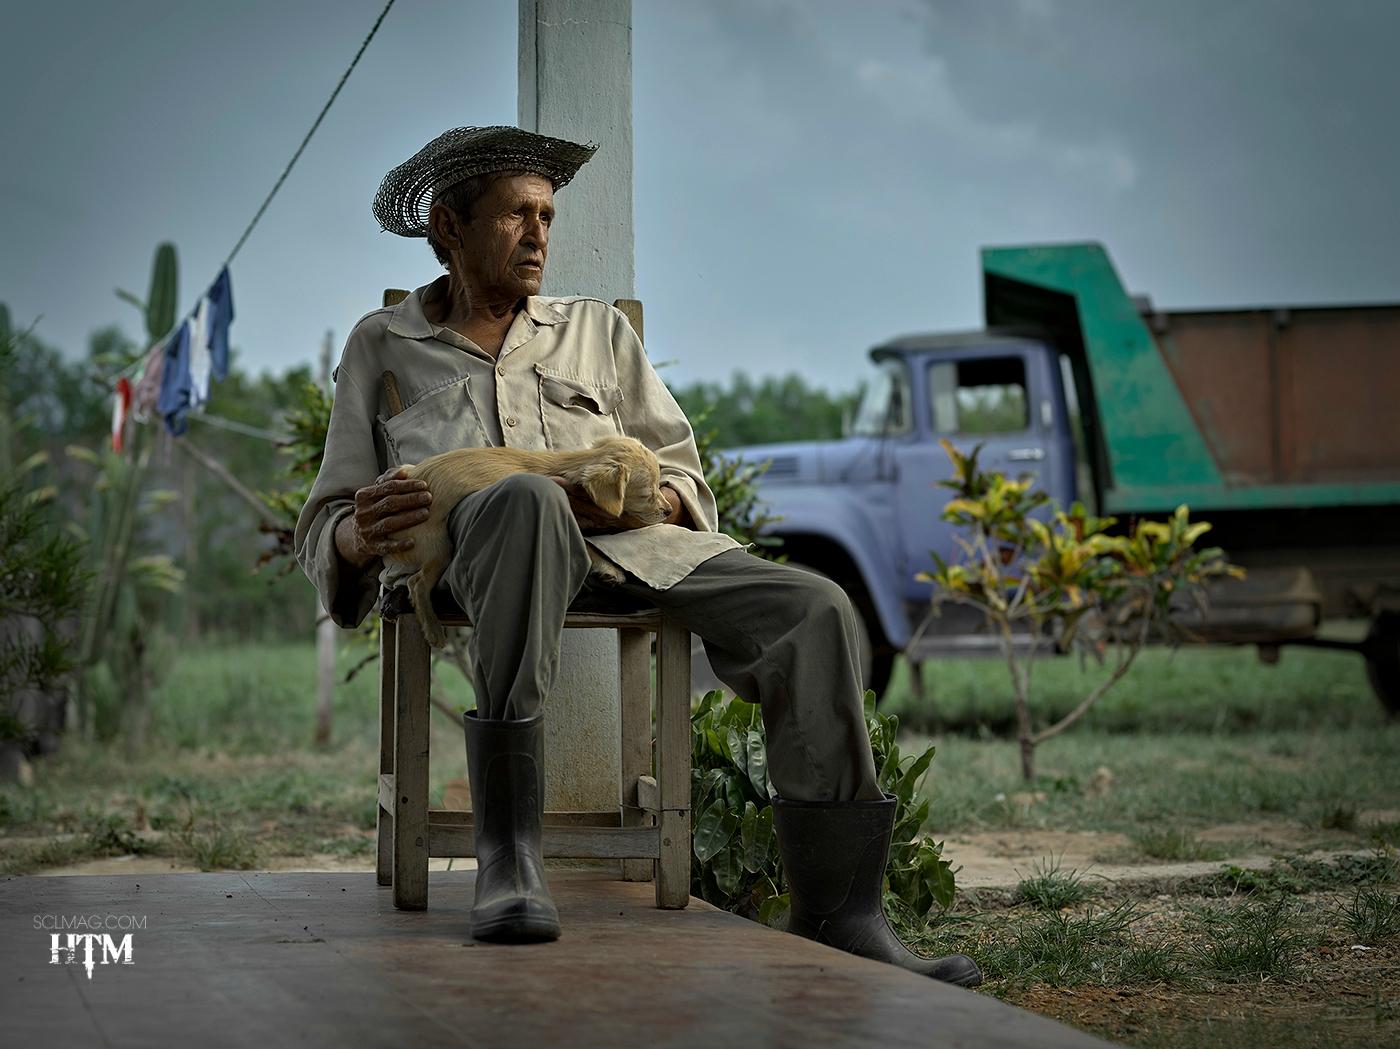 People_of_Cuba_11